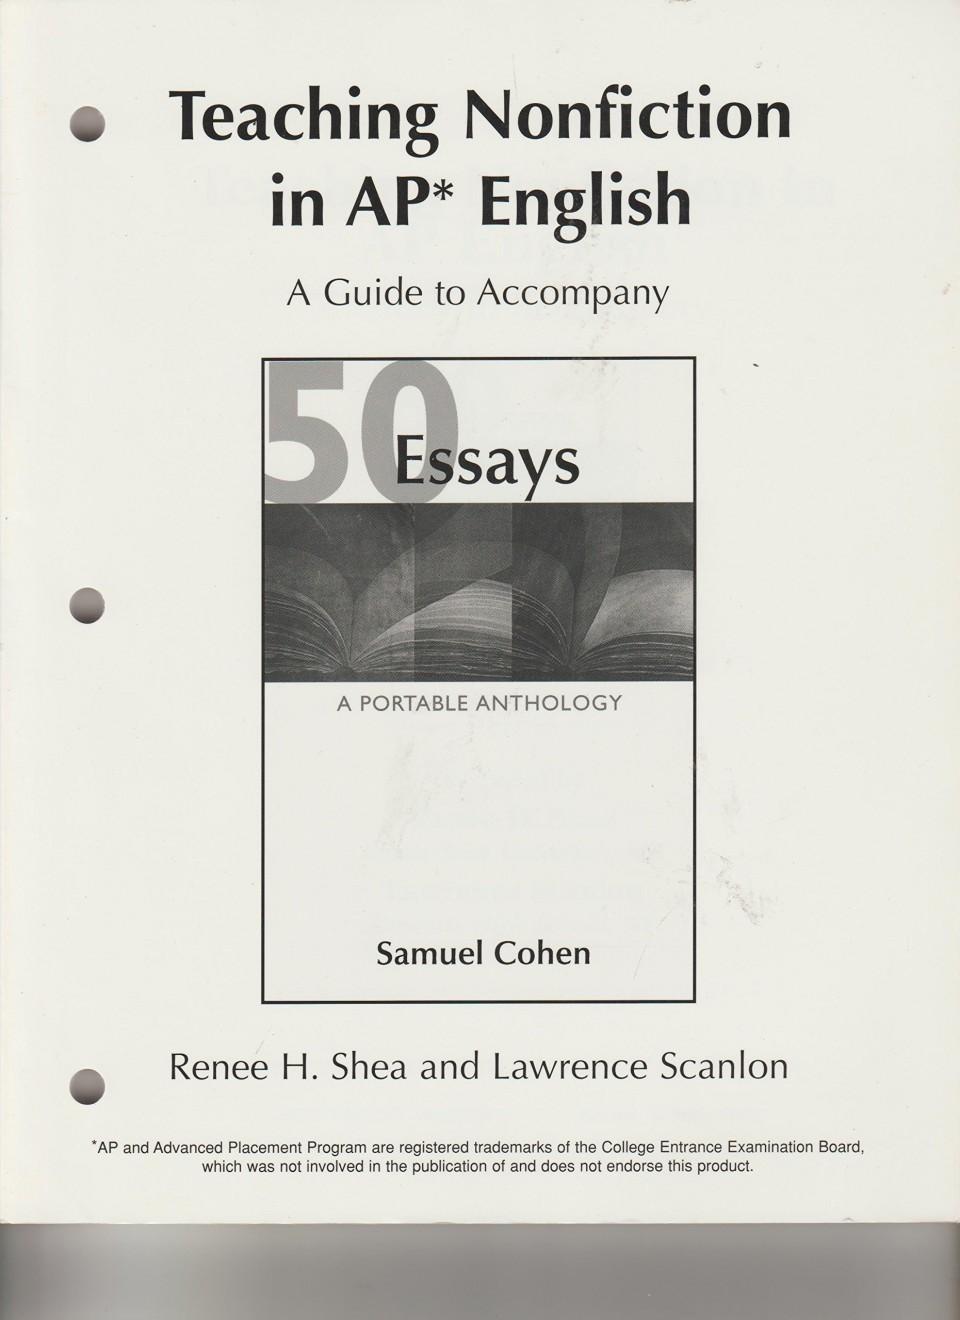 013 Essay Example 81qzov2hjtl Essays Portable Anthology 4th Edition Awful 50 A Pdf Free 960